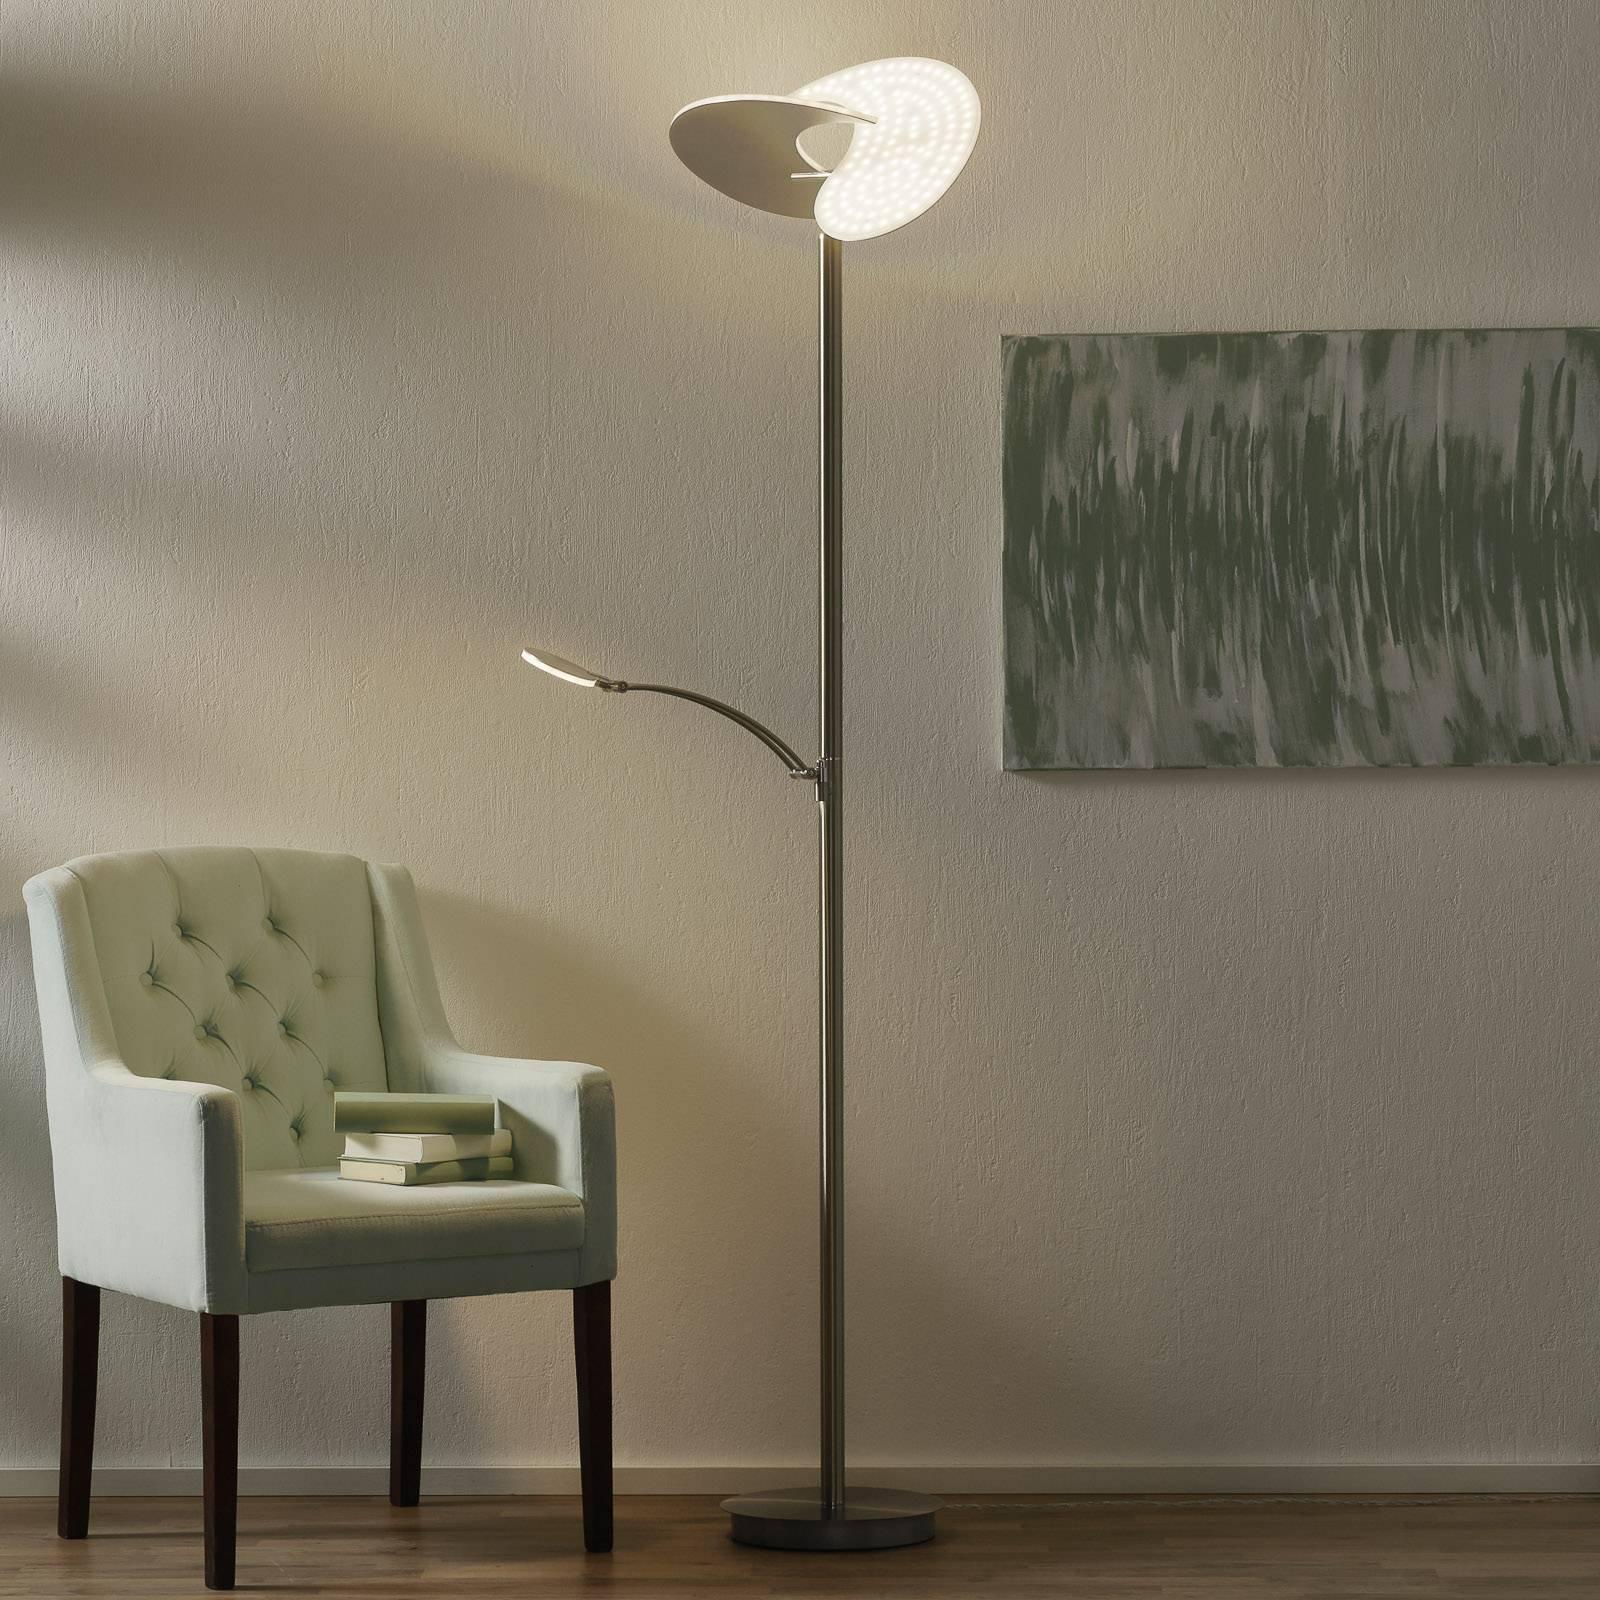 B-Leuchten Malibu LED-gulvlampe dimbar, nikkel